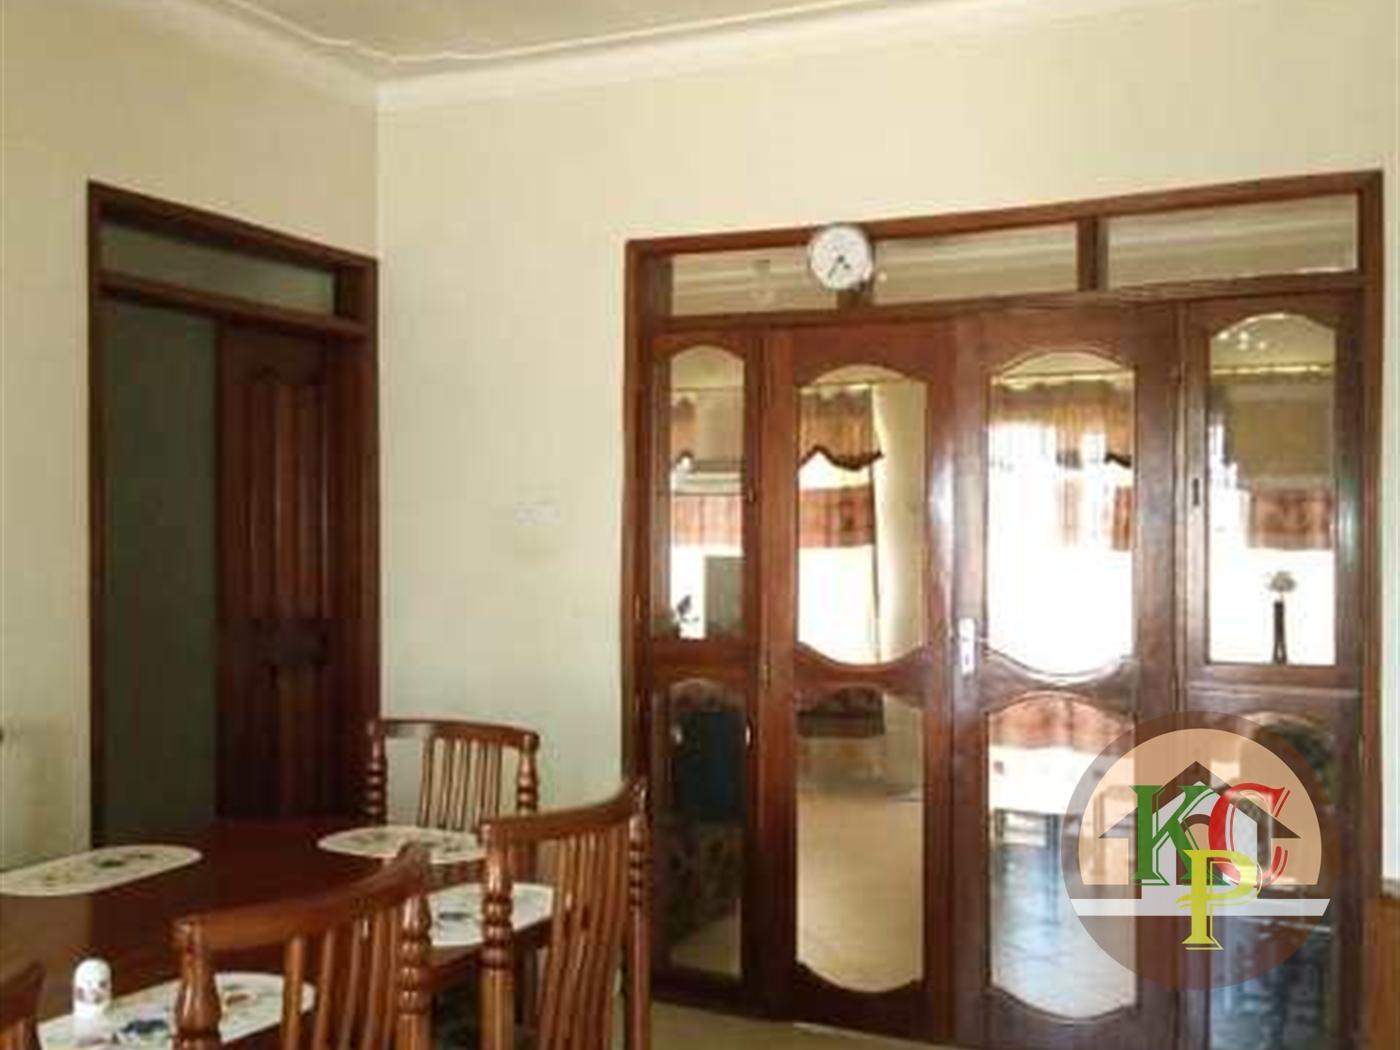 Bungalow for sale in Nabingo Kampala